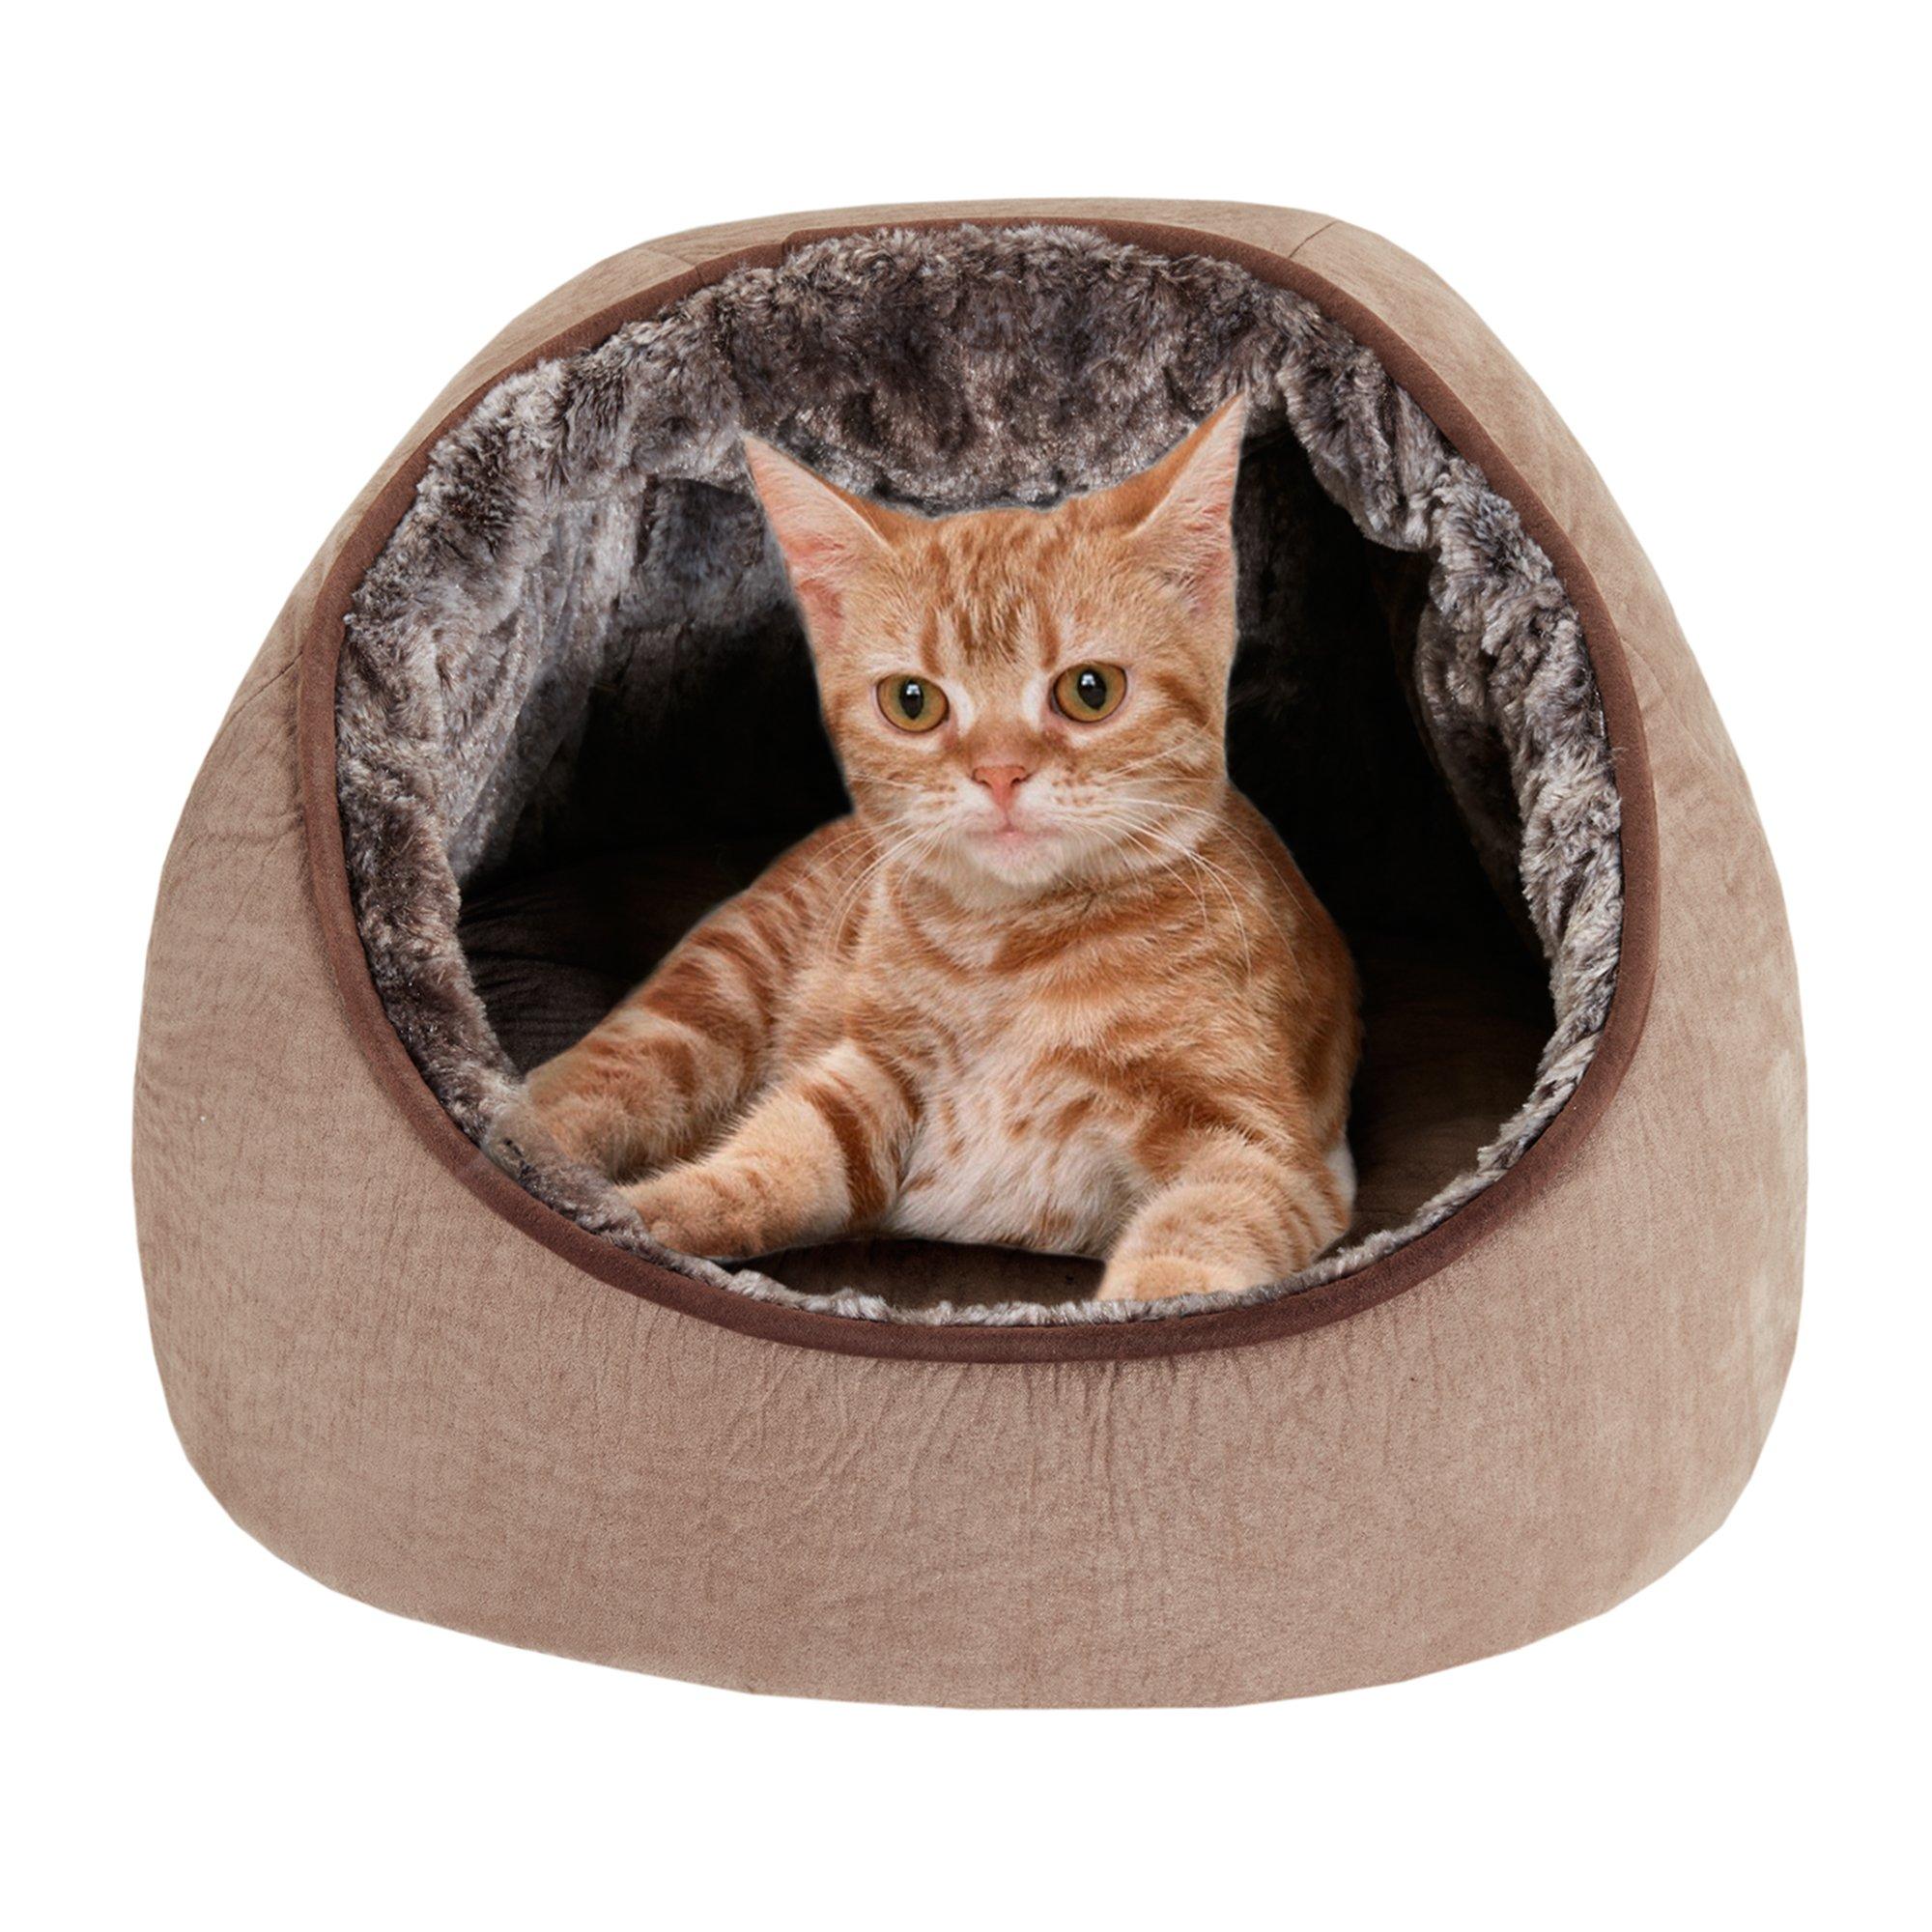 JLA Hooded Snuggler Tan Cat Bed